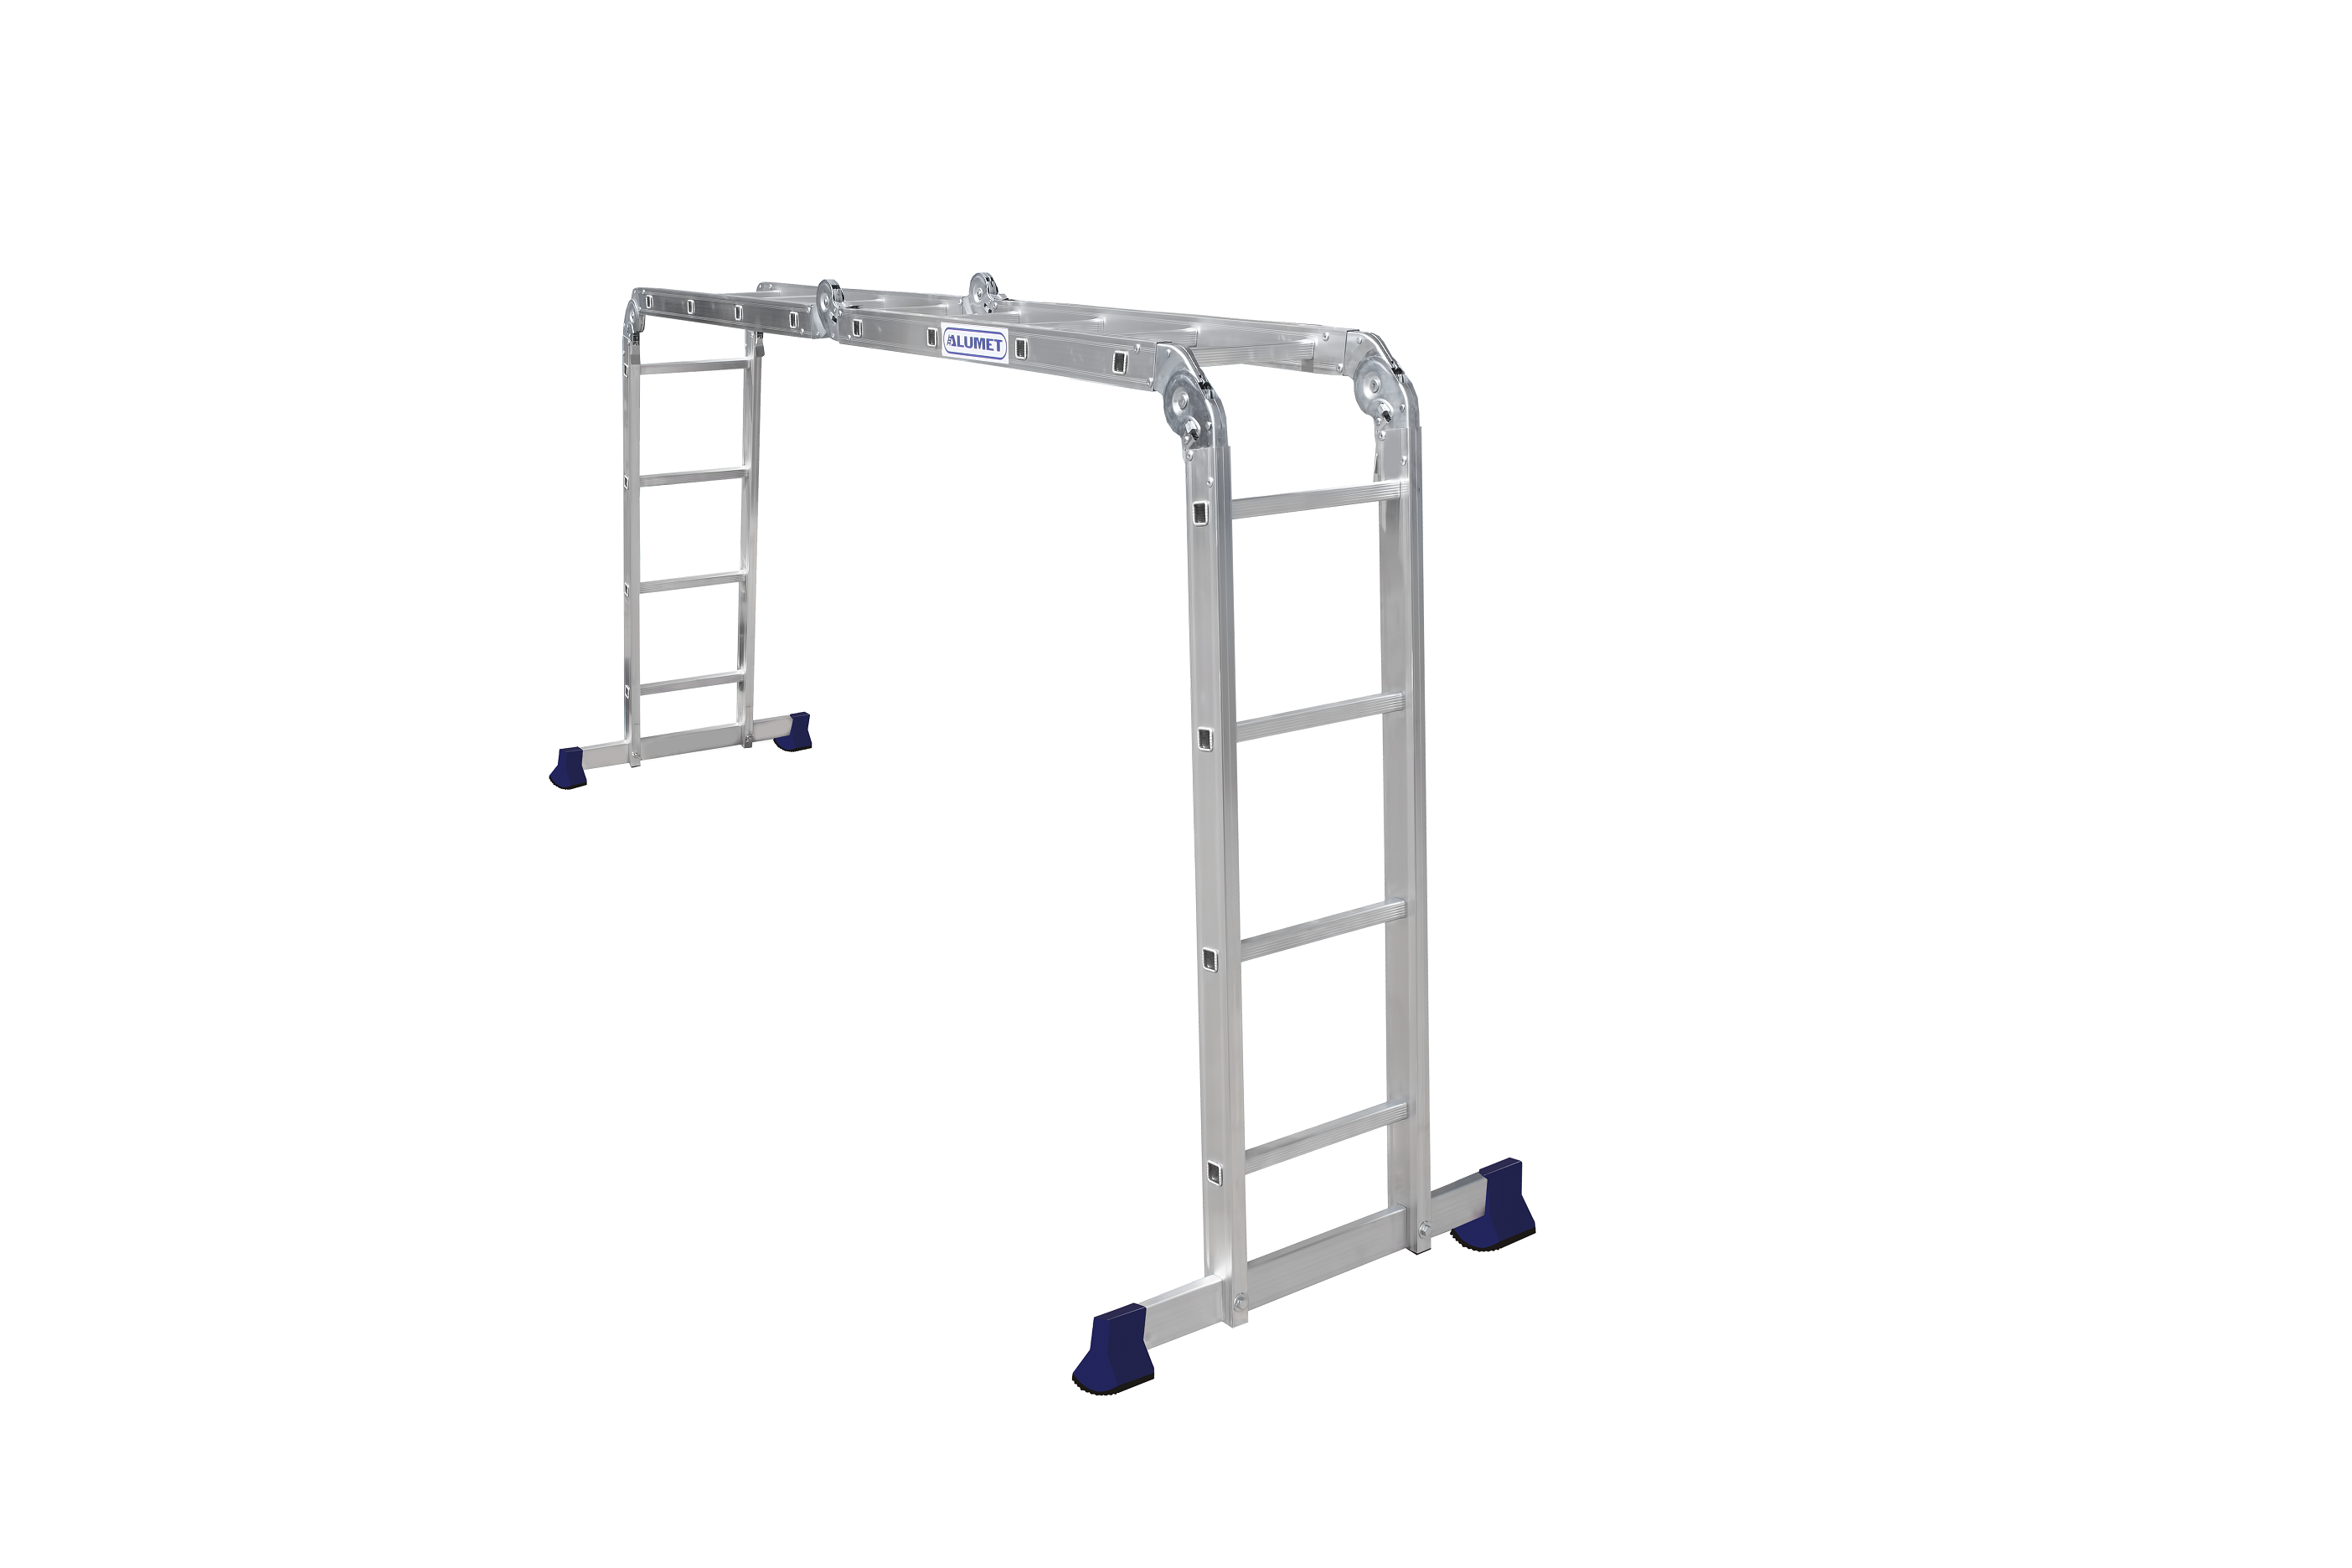 ALUMET Облегченная лестница-трансформер 4Х4 (арт. TL4044)